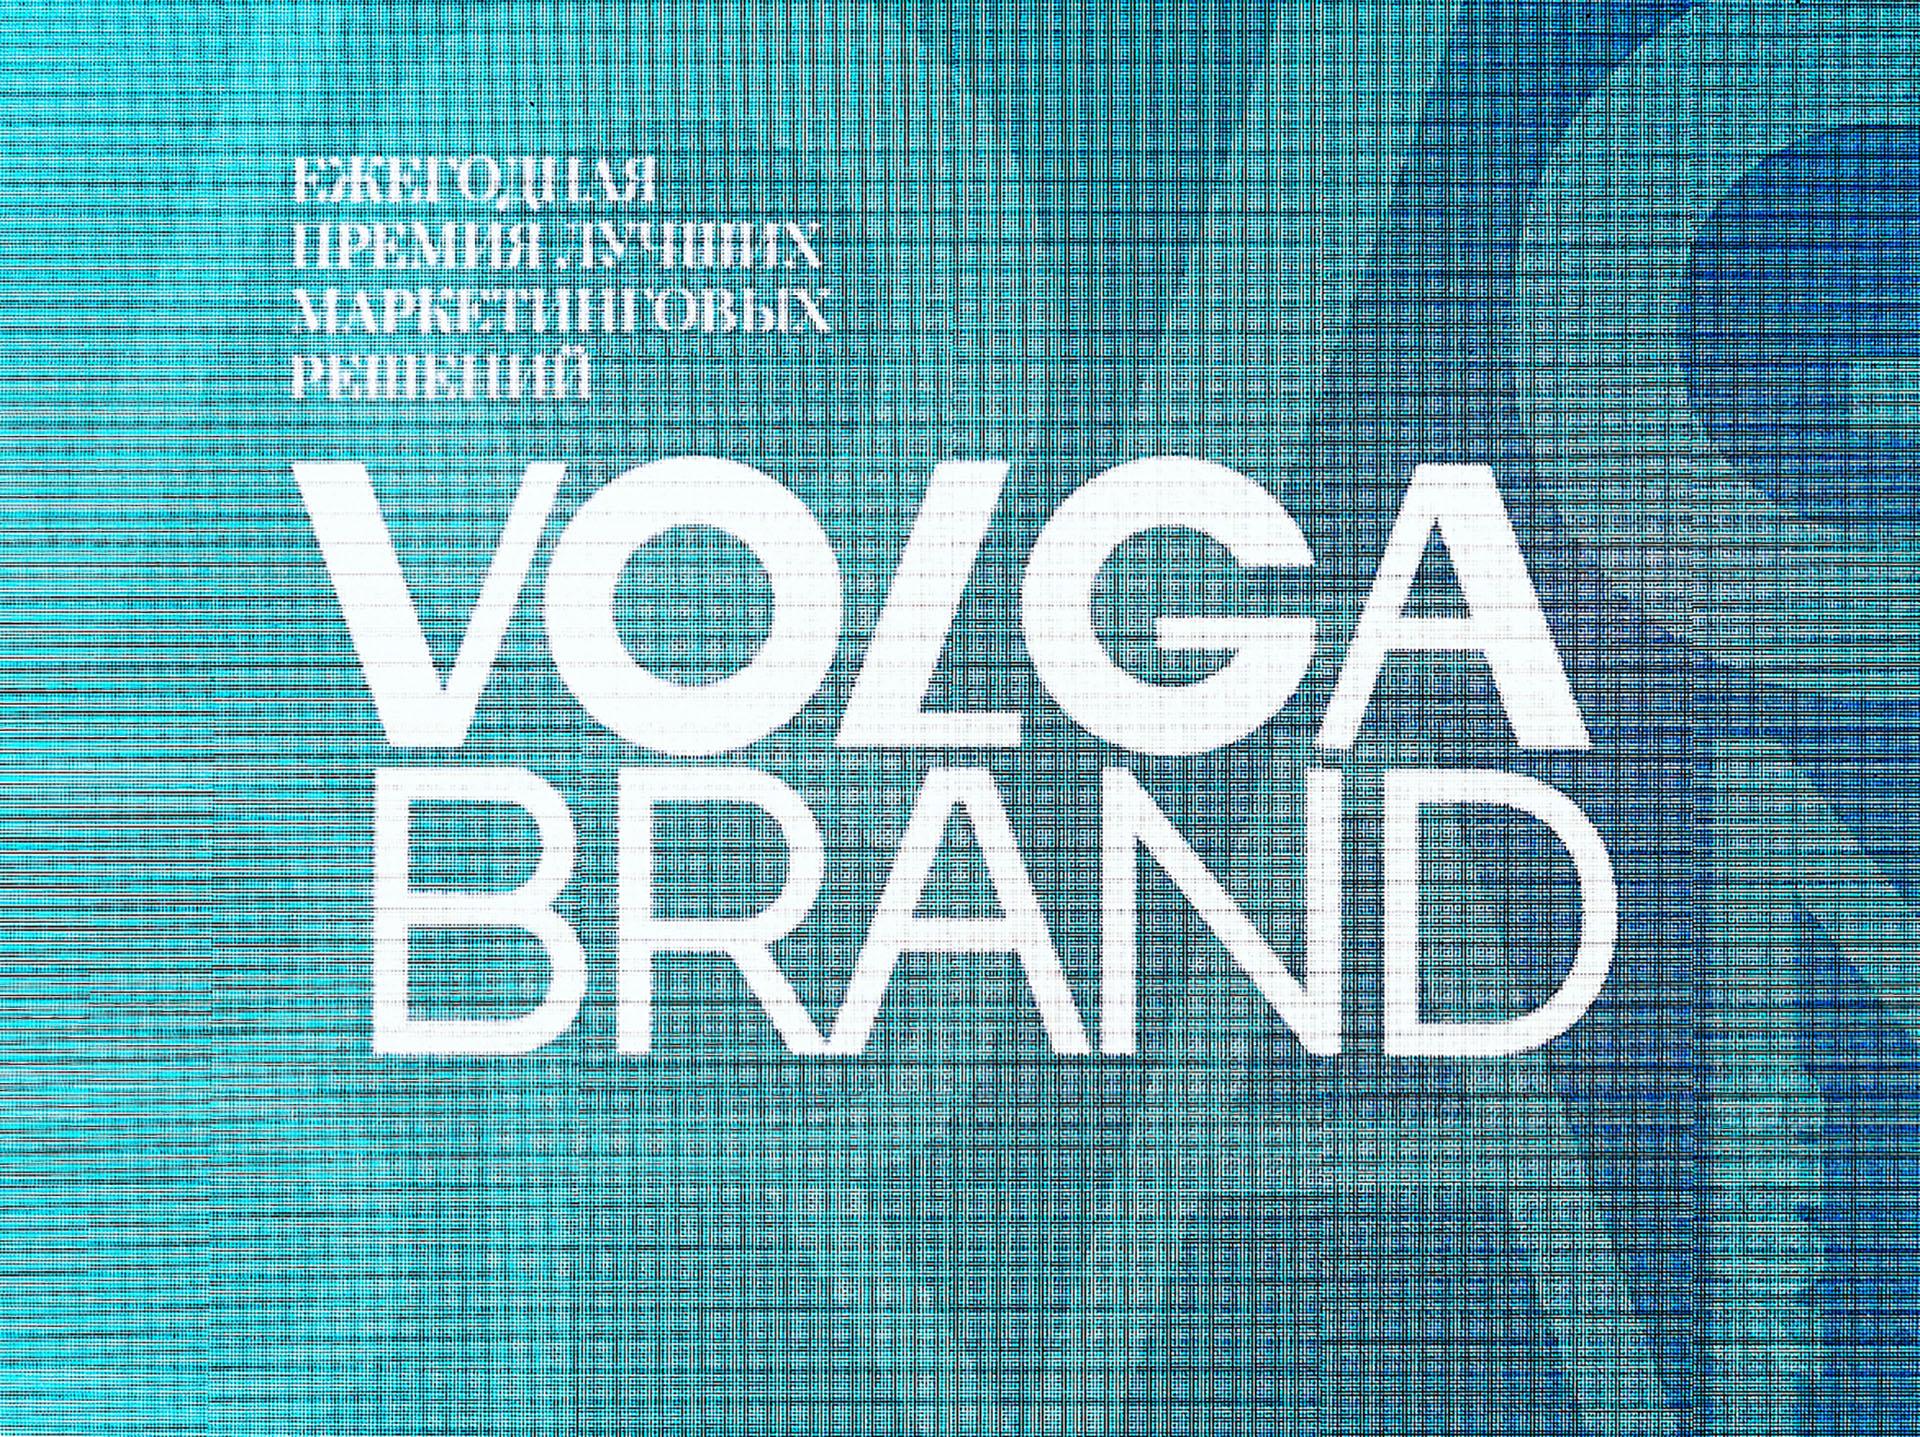 Получили премию Volga Brand 2019 за сайт groupdsk.ru